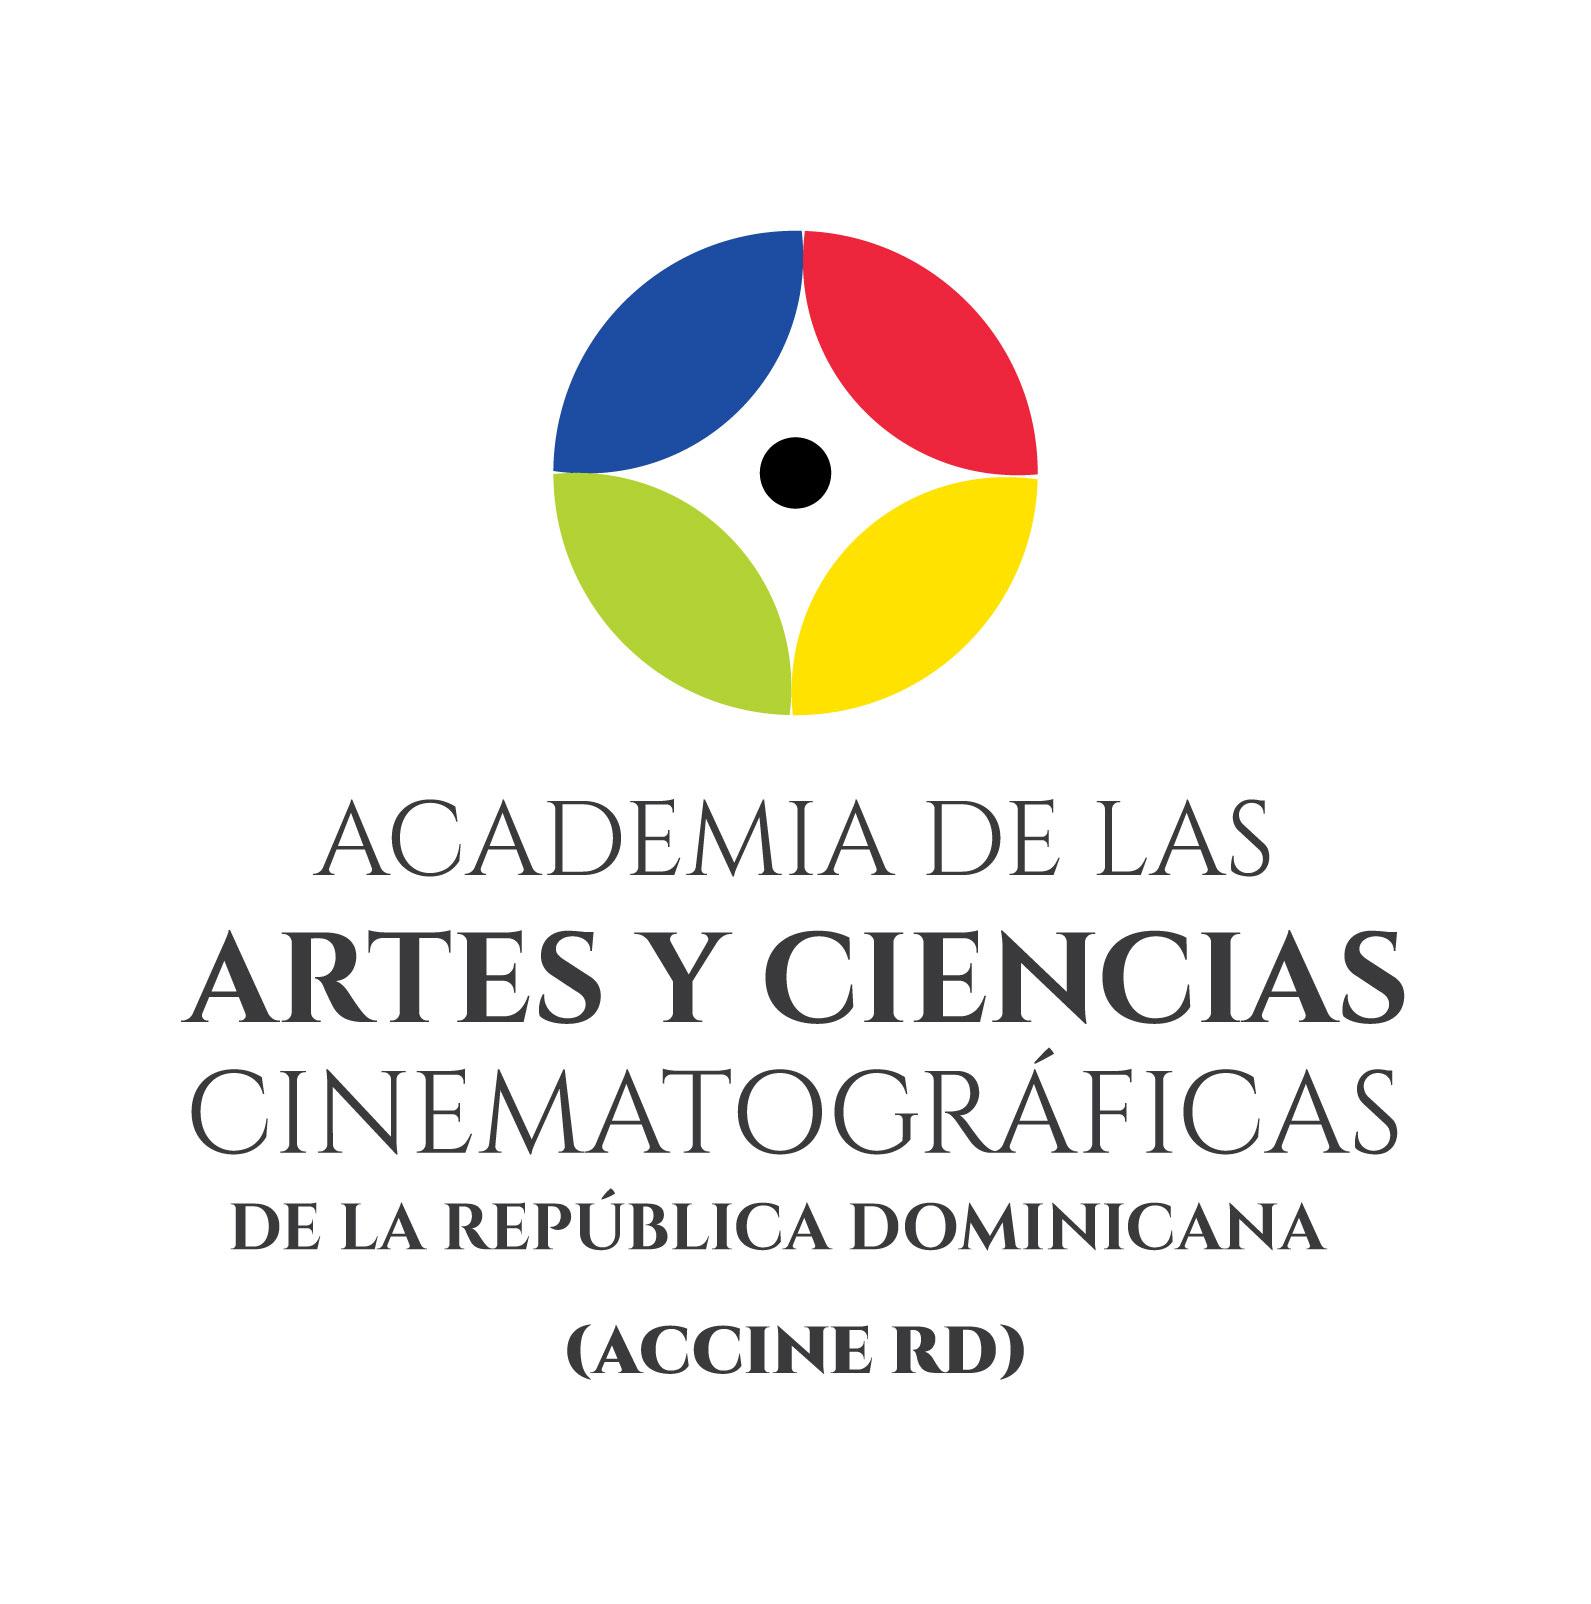 <b>LA ACADEMIA DE CINE DE REPÚBLICA DOMINICANA SE INCORPORA A FIACINE</b>